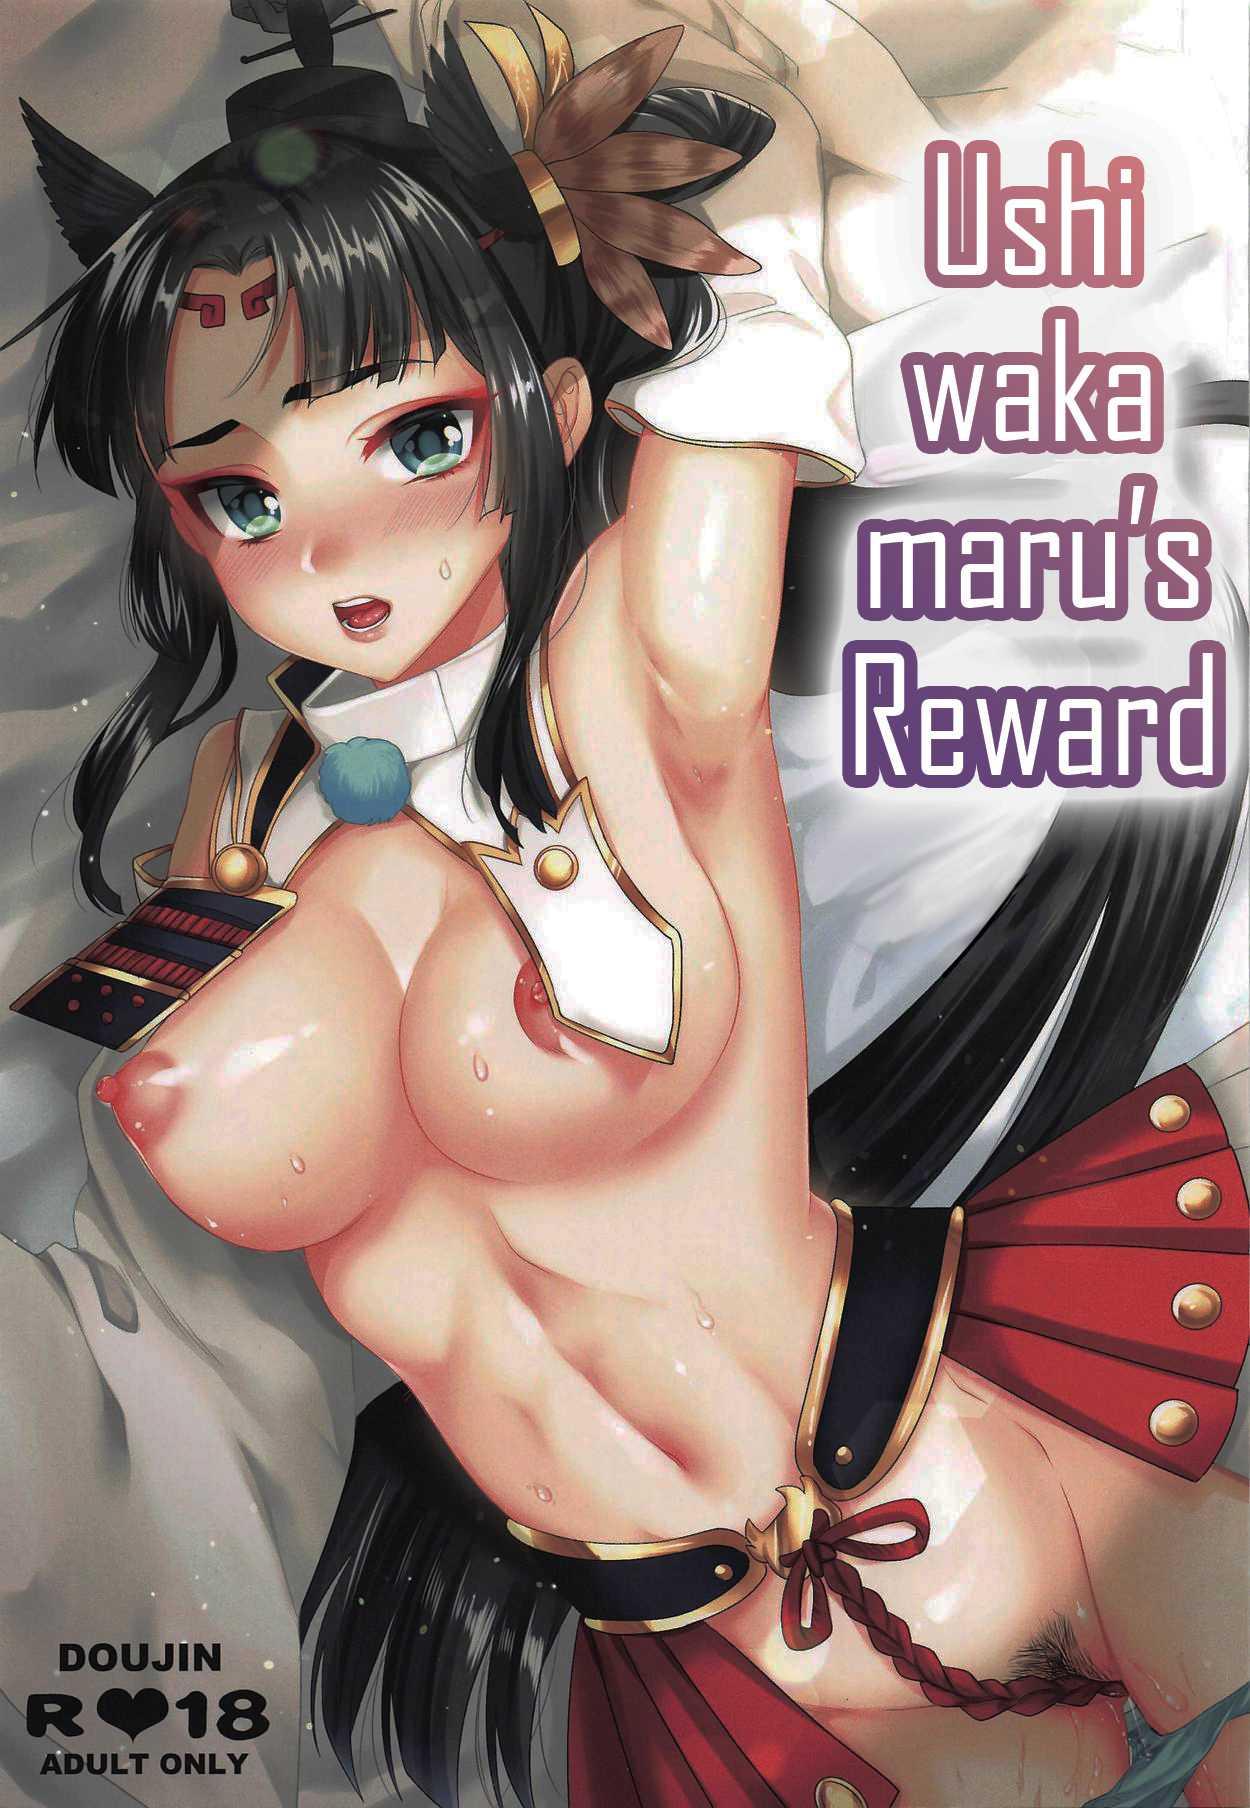 kiseki-kisaki-noah-ushiwakamarus-reward